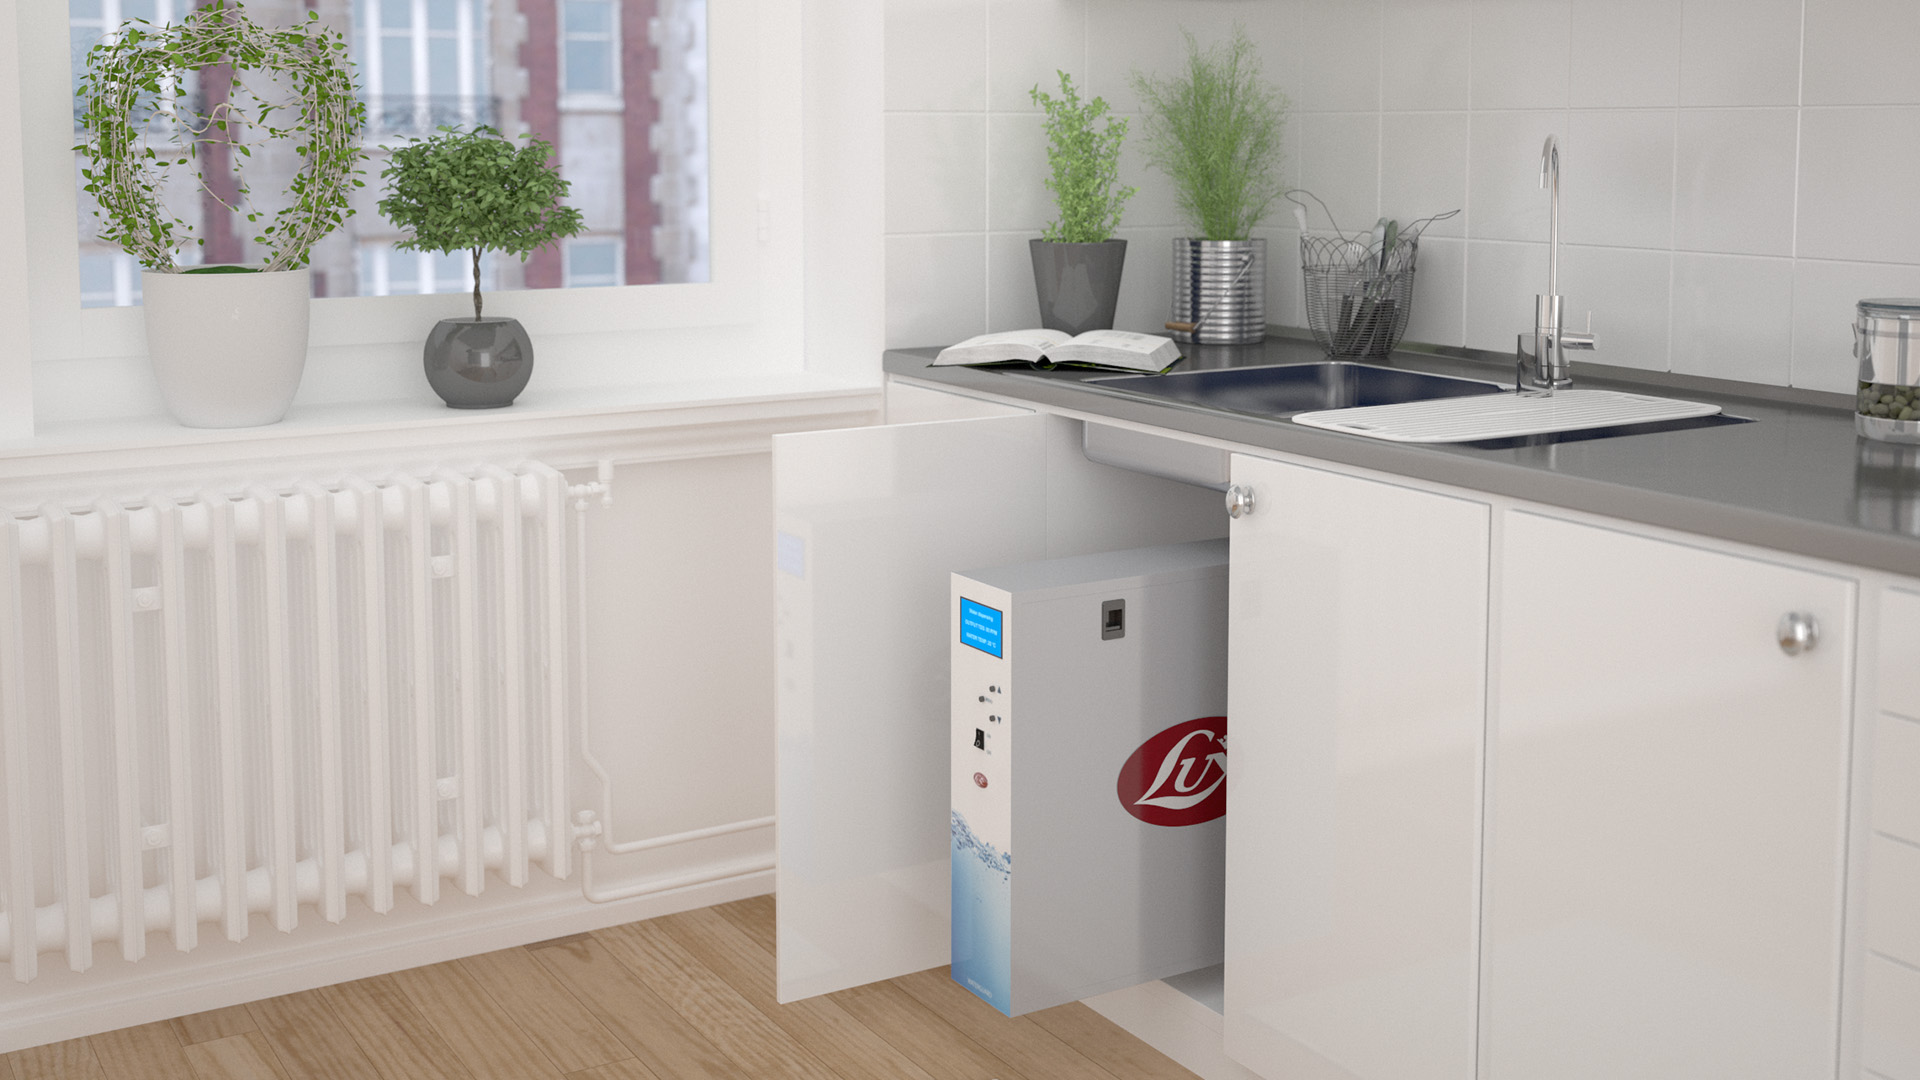 Waterguard premium water purifier - Lux International